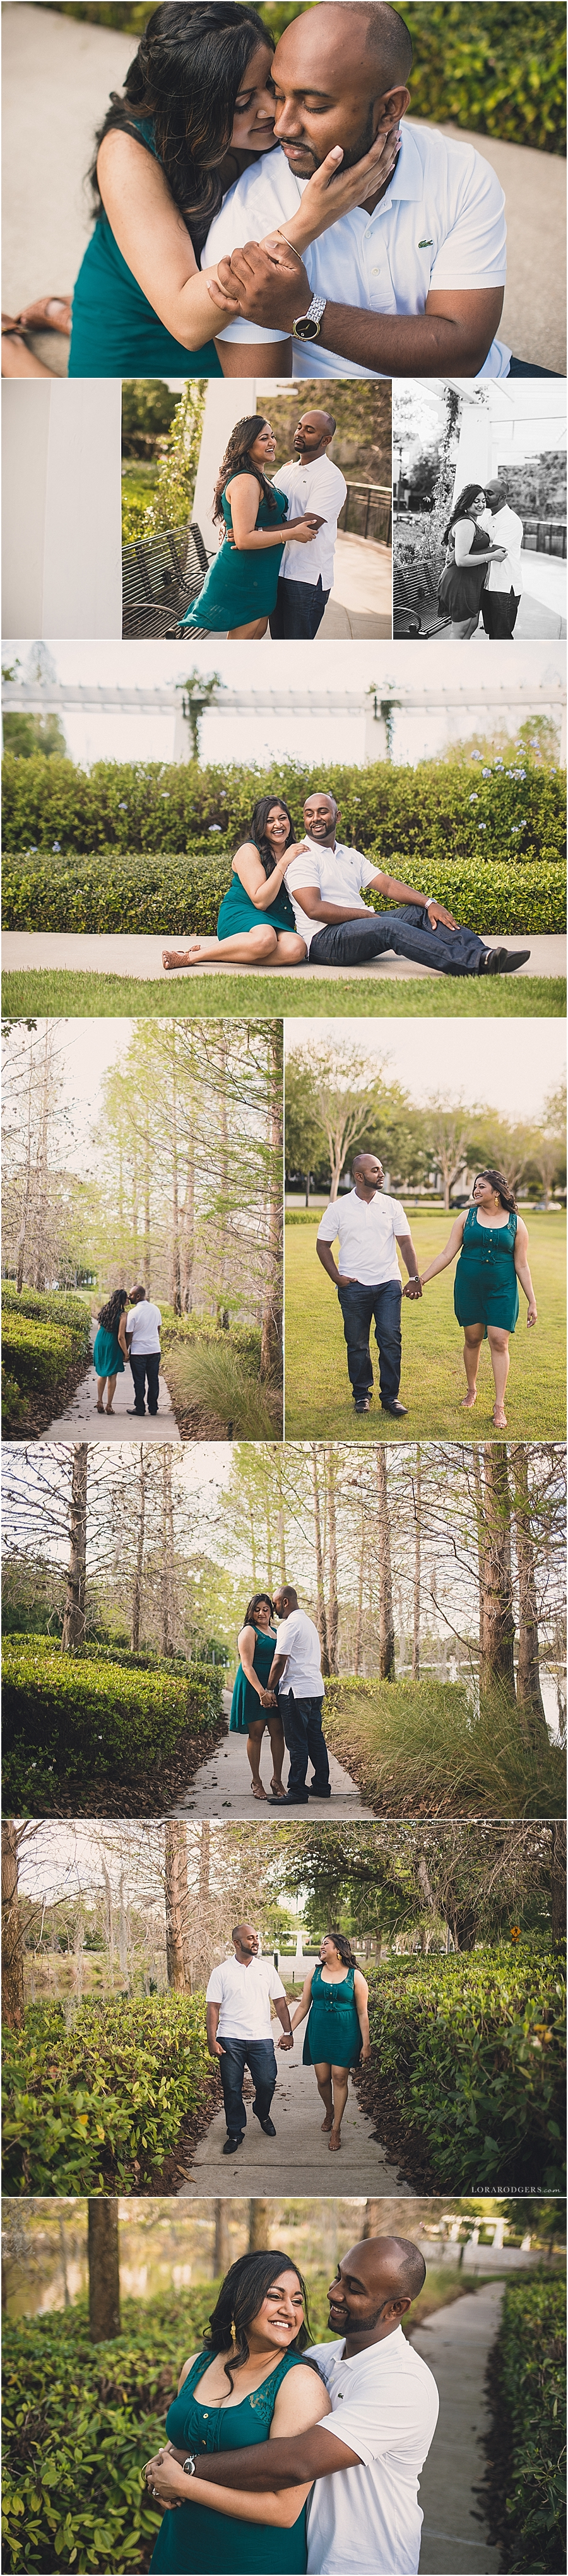 Baldwin_Park_Orlando_Florida_Engagement_003